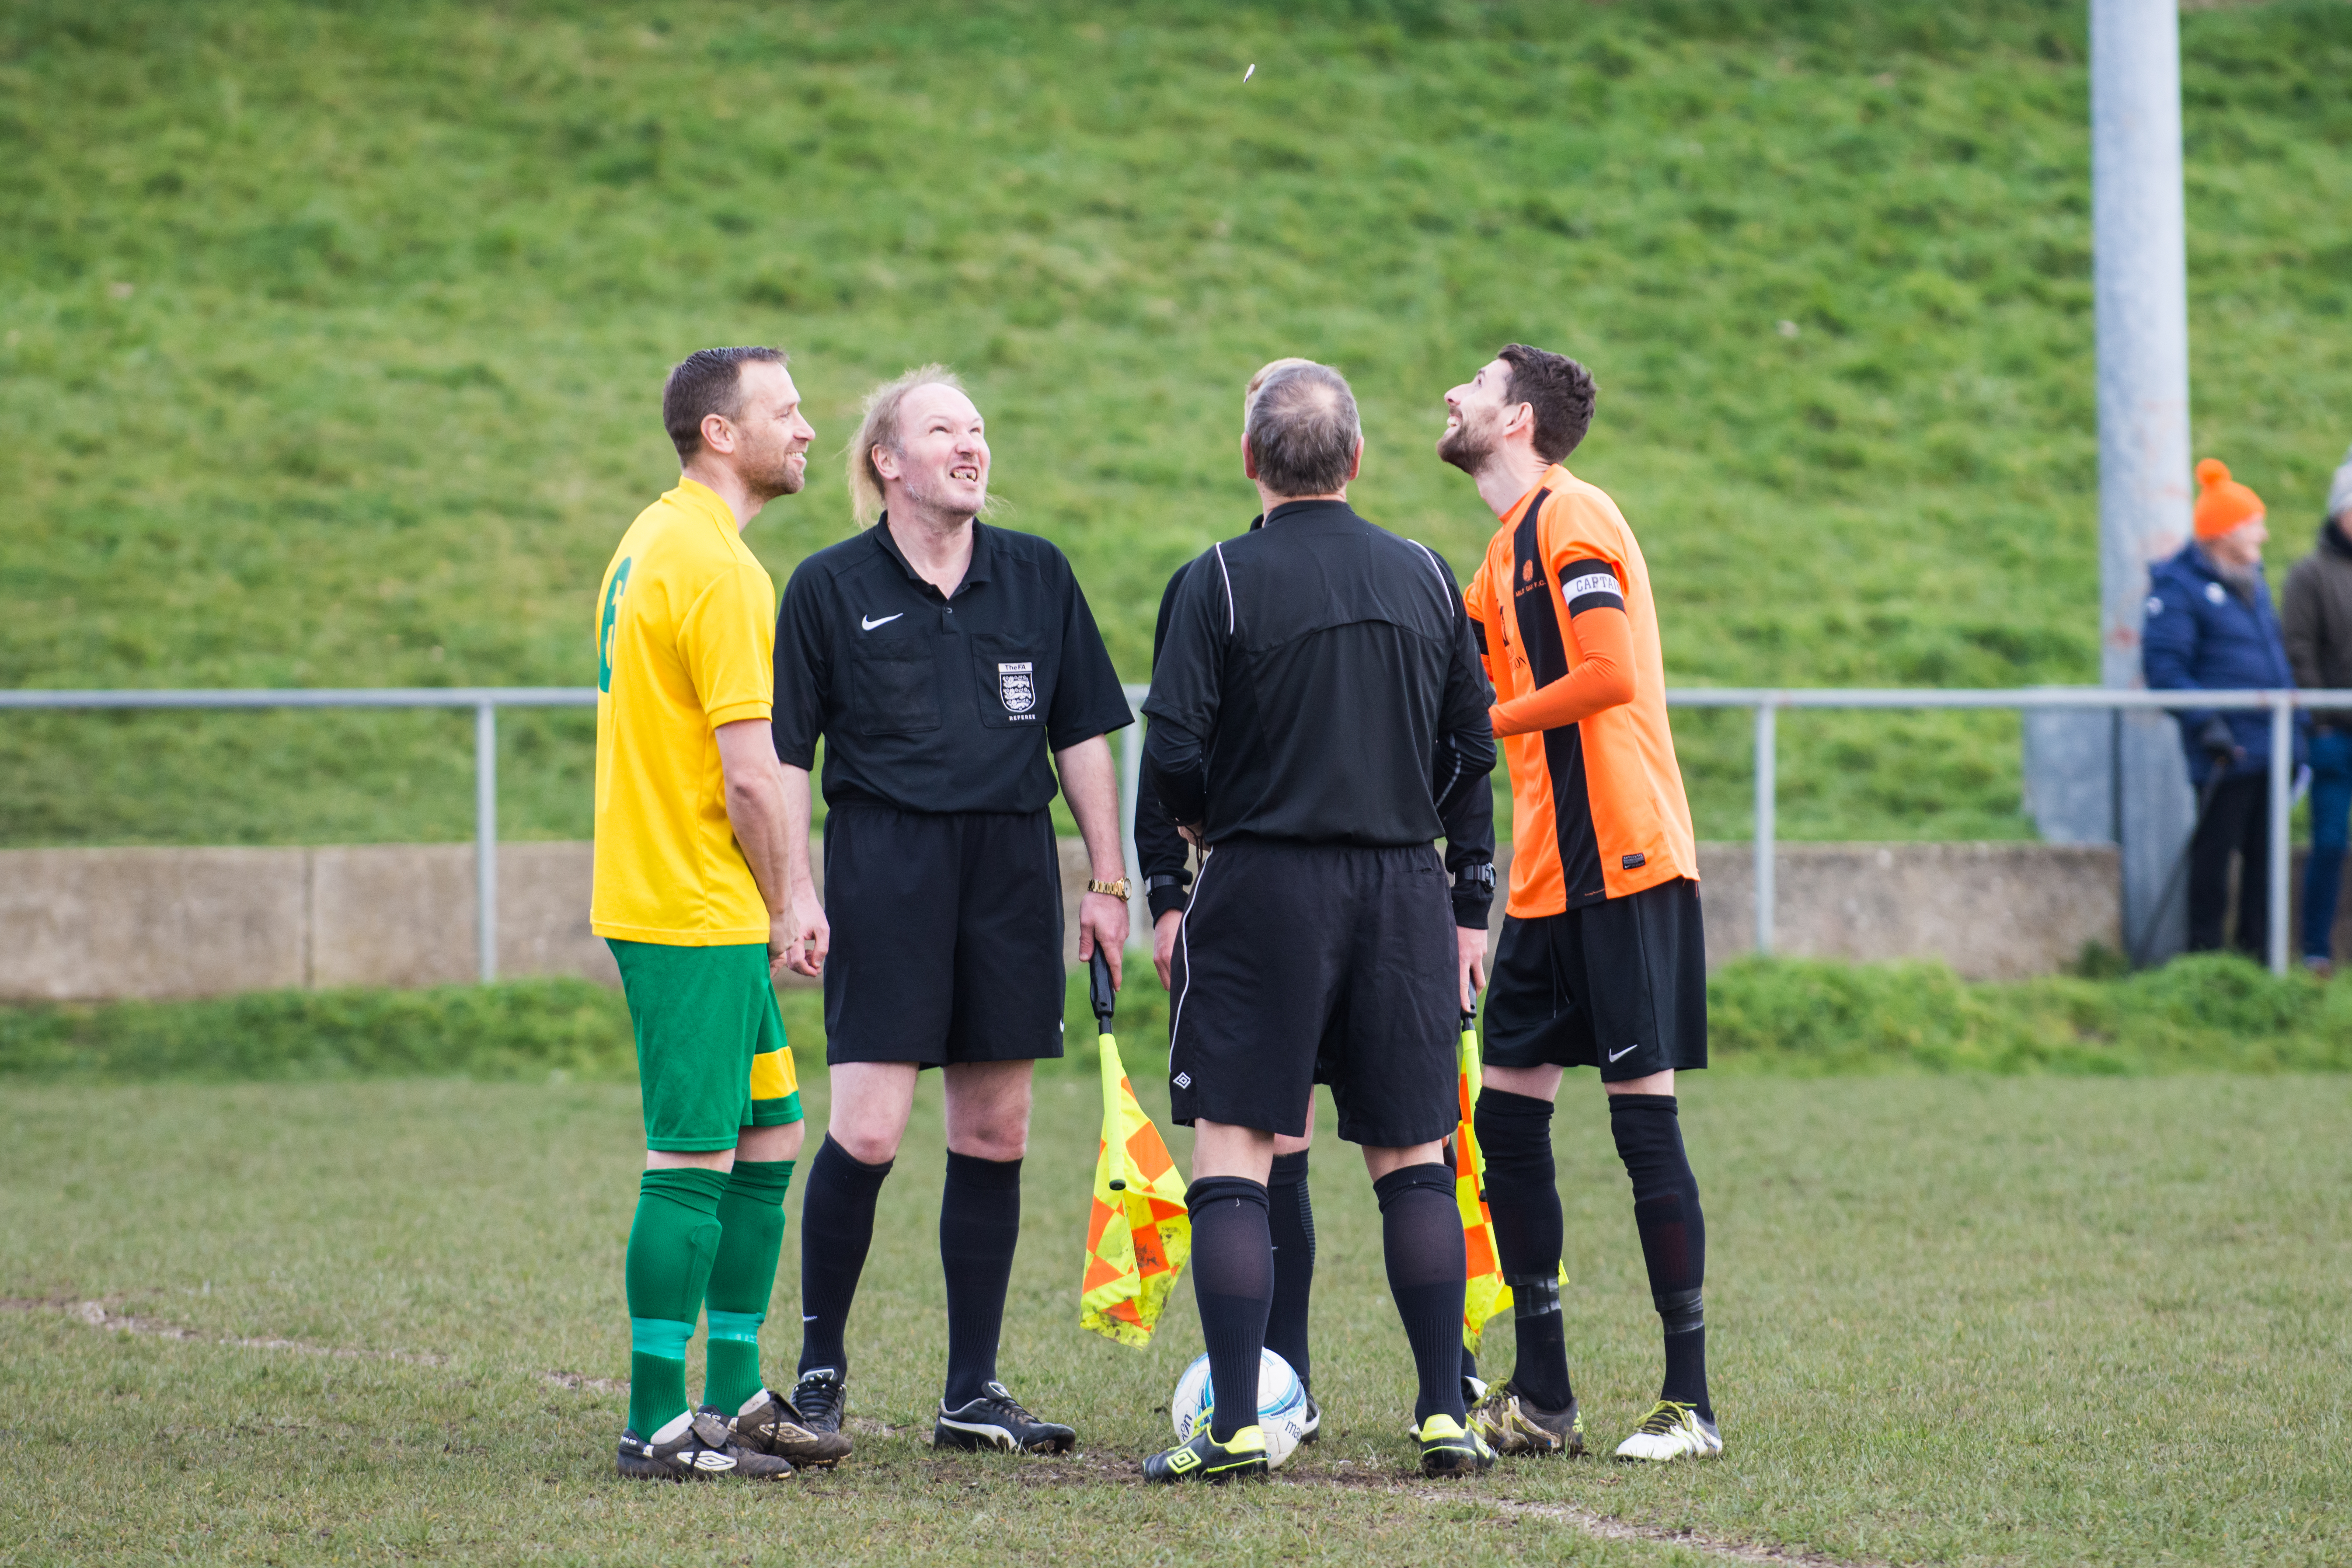 DAVID_JEFFERY Mile Oak FC vs Hailsham Town FC 24.03.18 11